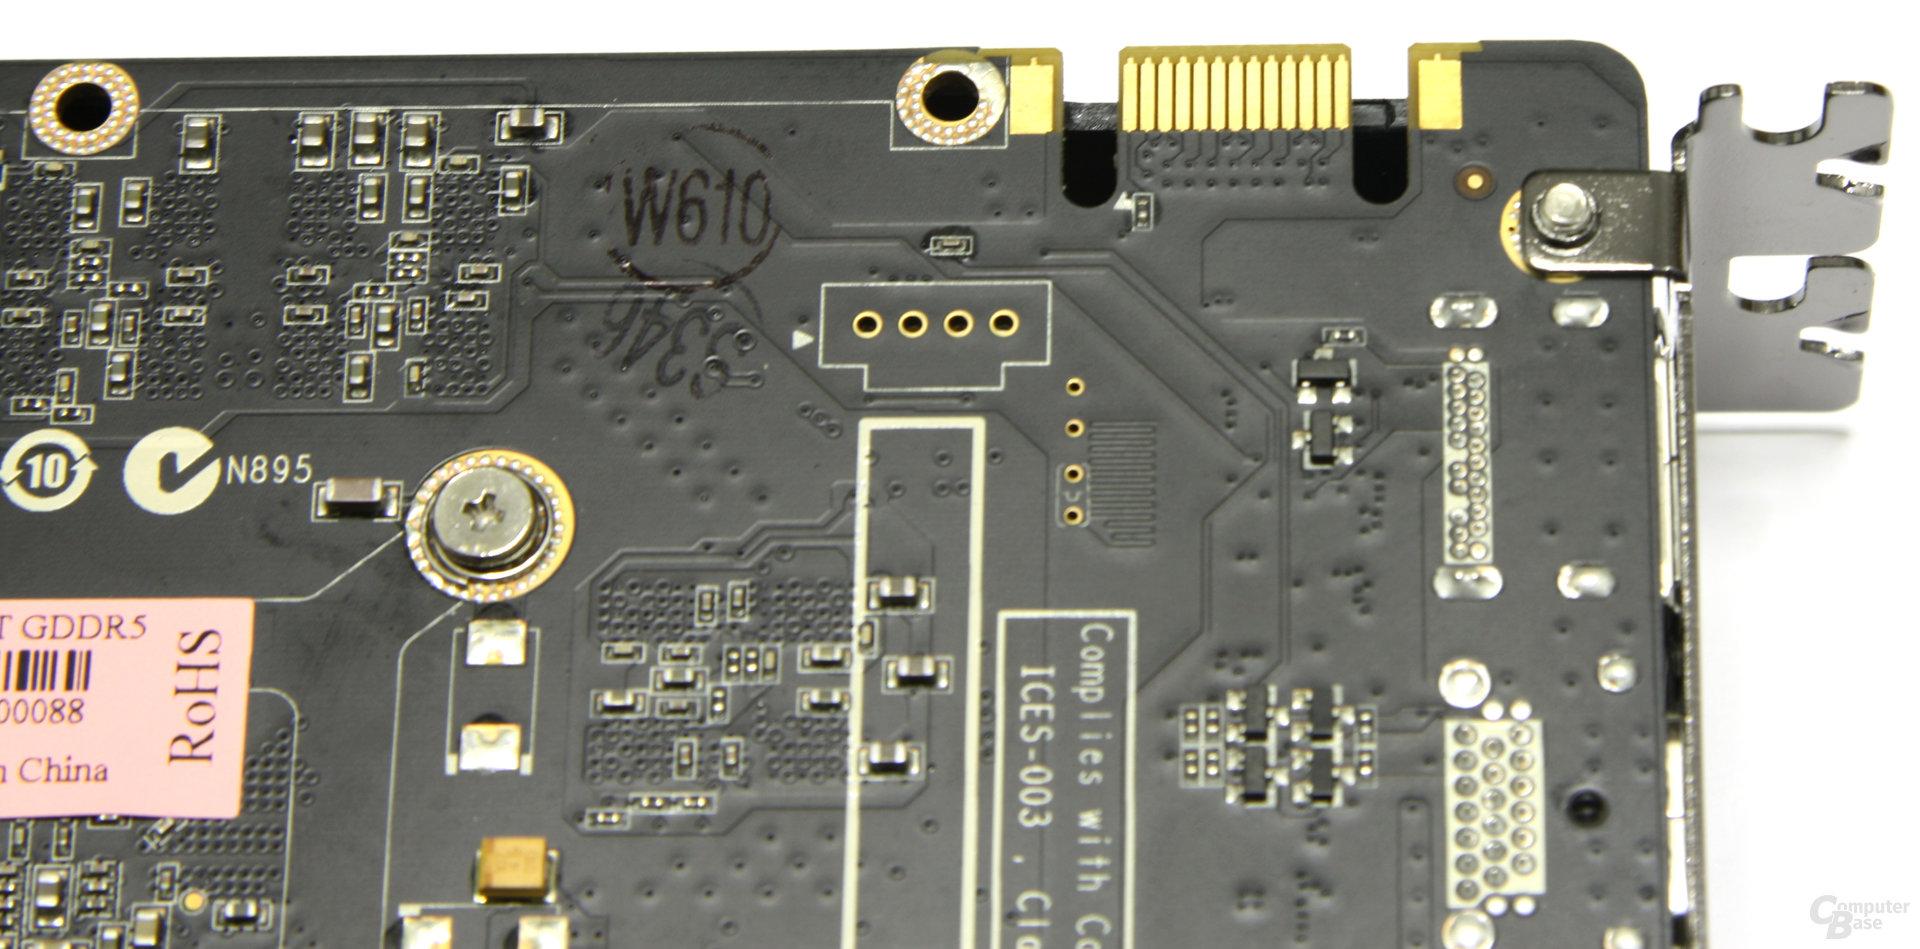 GeForce GTX 560 Ti SLI-Anschluss